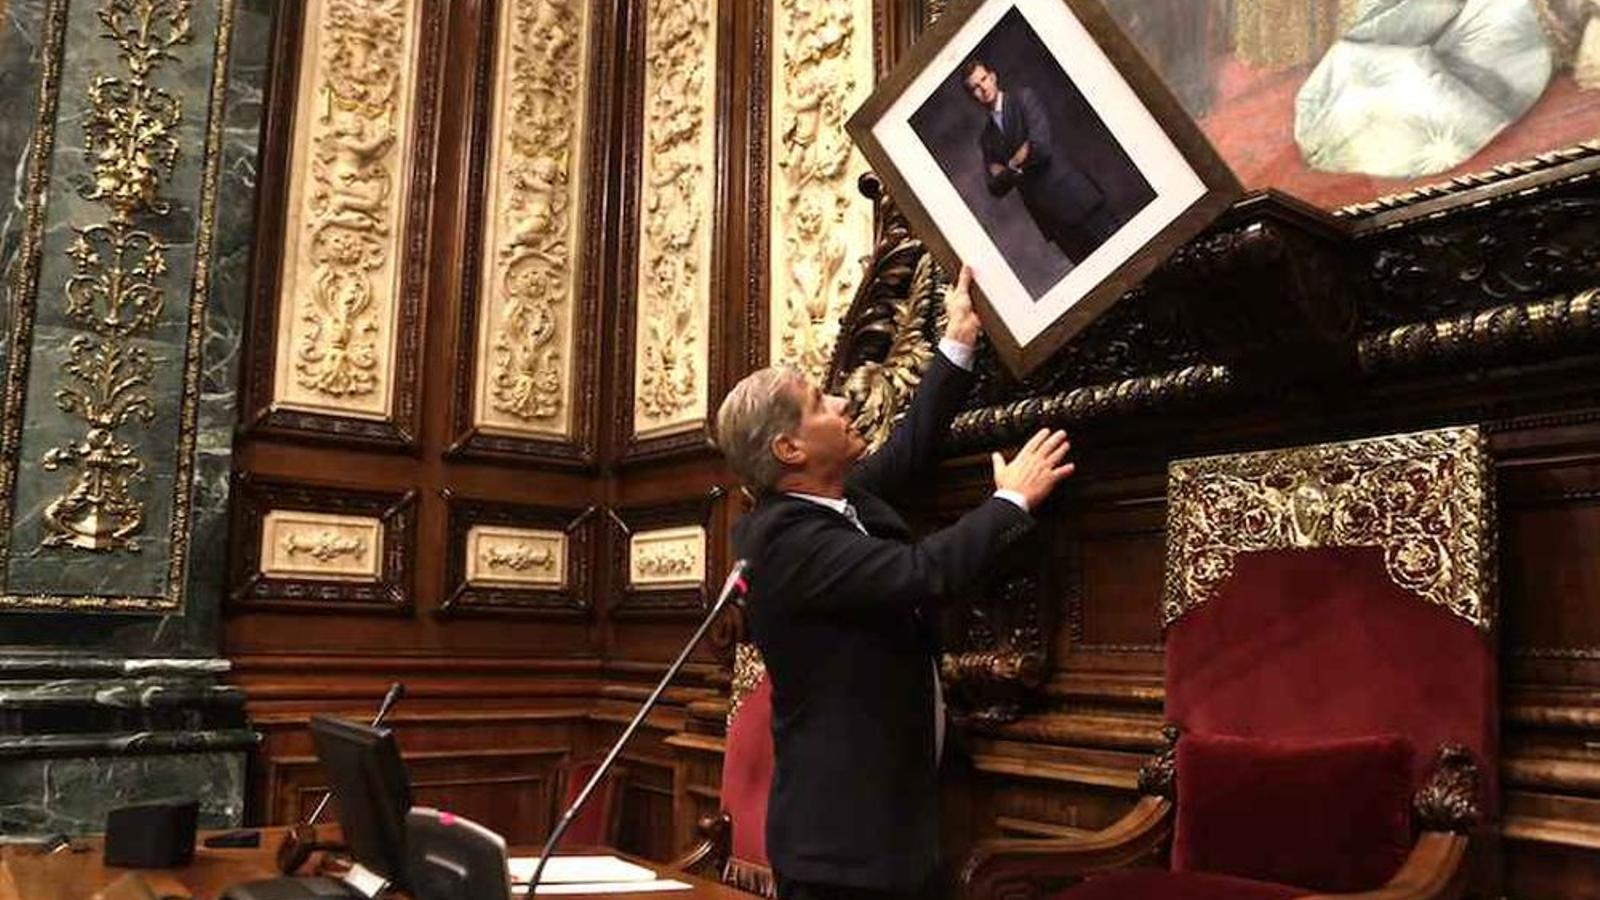 El PP col·loca una foto de Felip VI on hi havia el bust de Joan Carles I